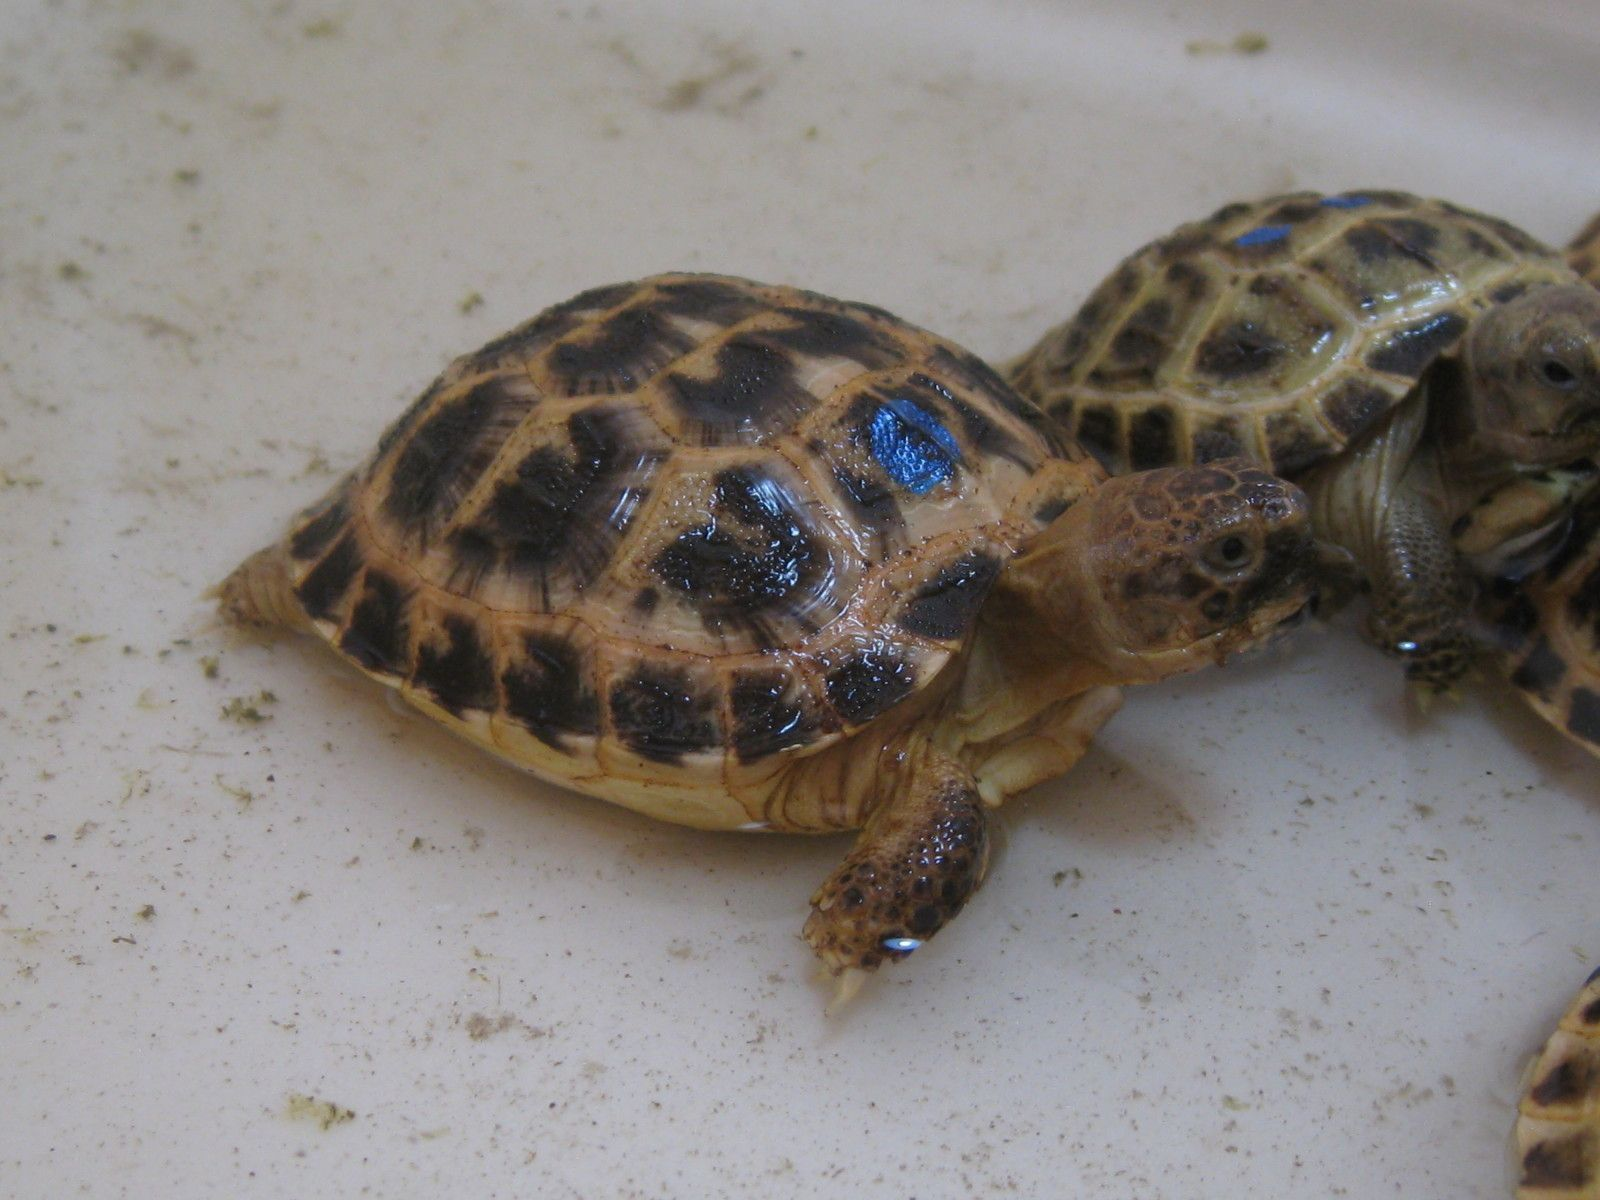 Russian tortoise care sheet baby specific tortoise ideas